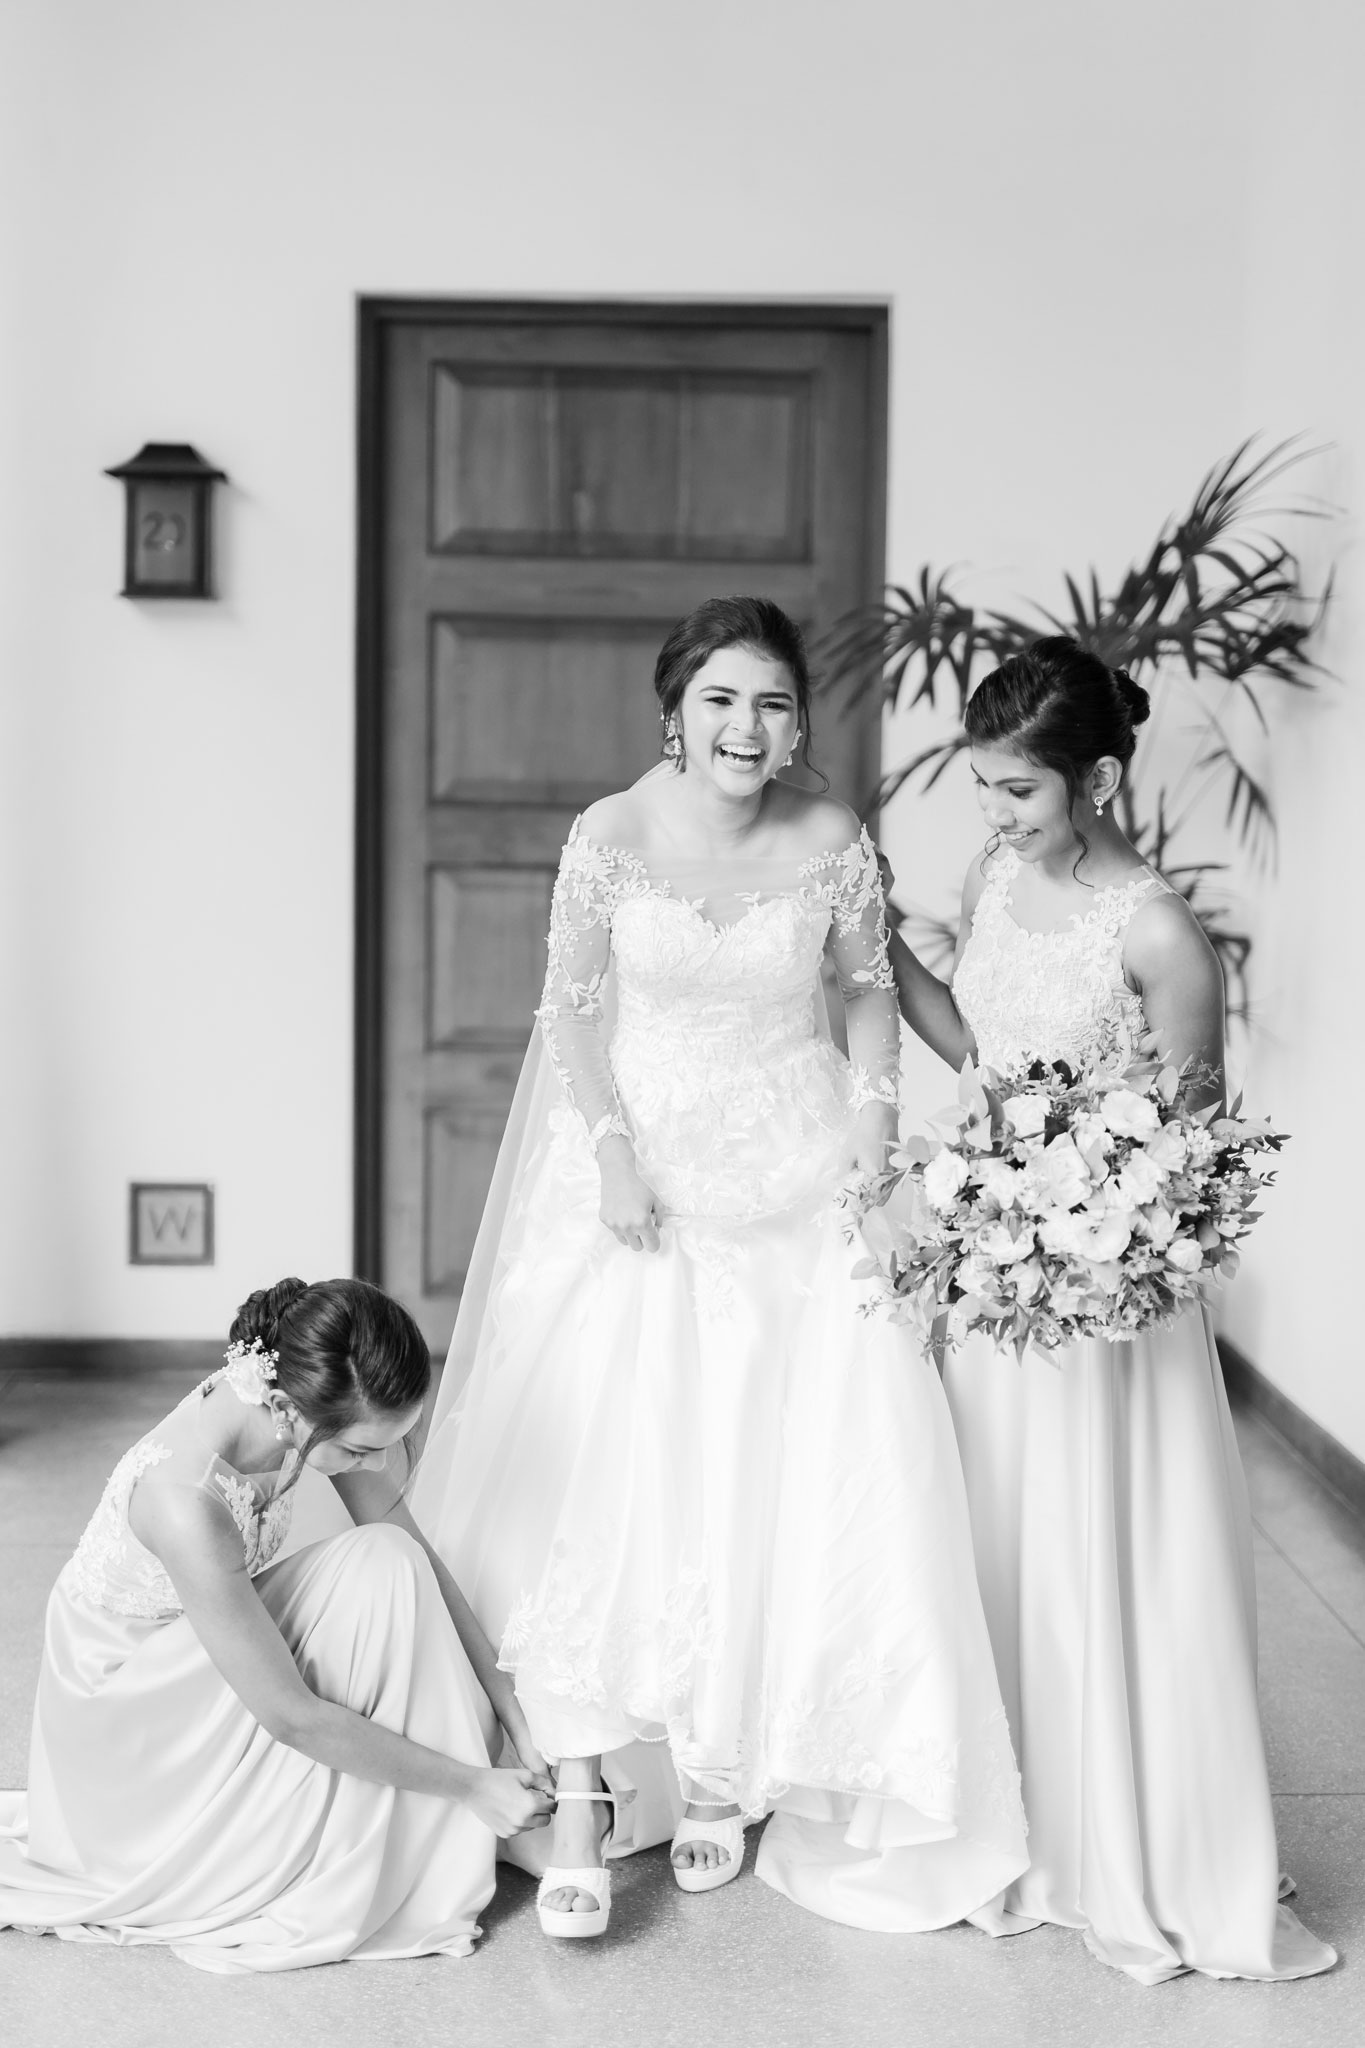 Hiruni & Akila - Prabath Kanishka Wedding Photography